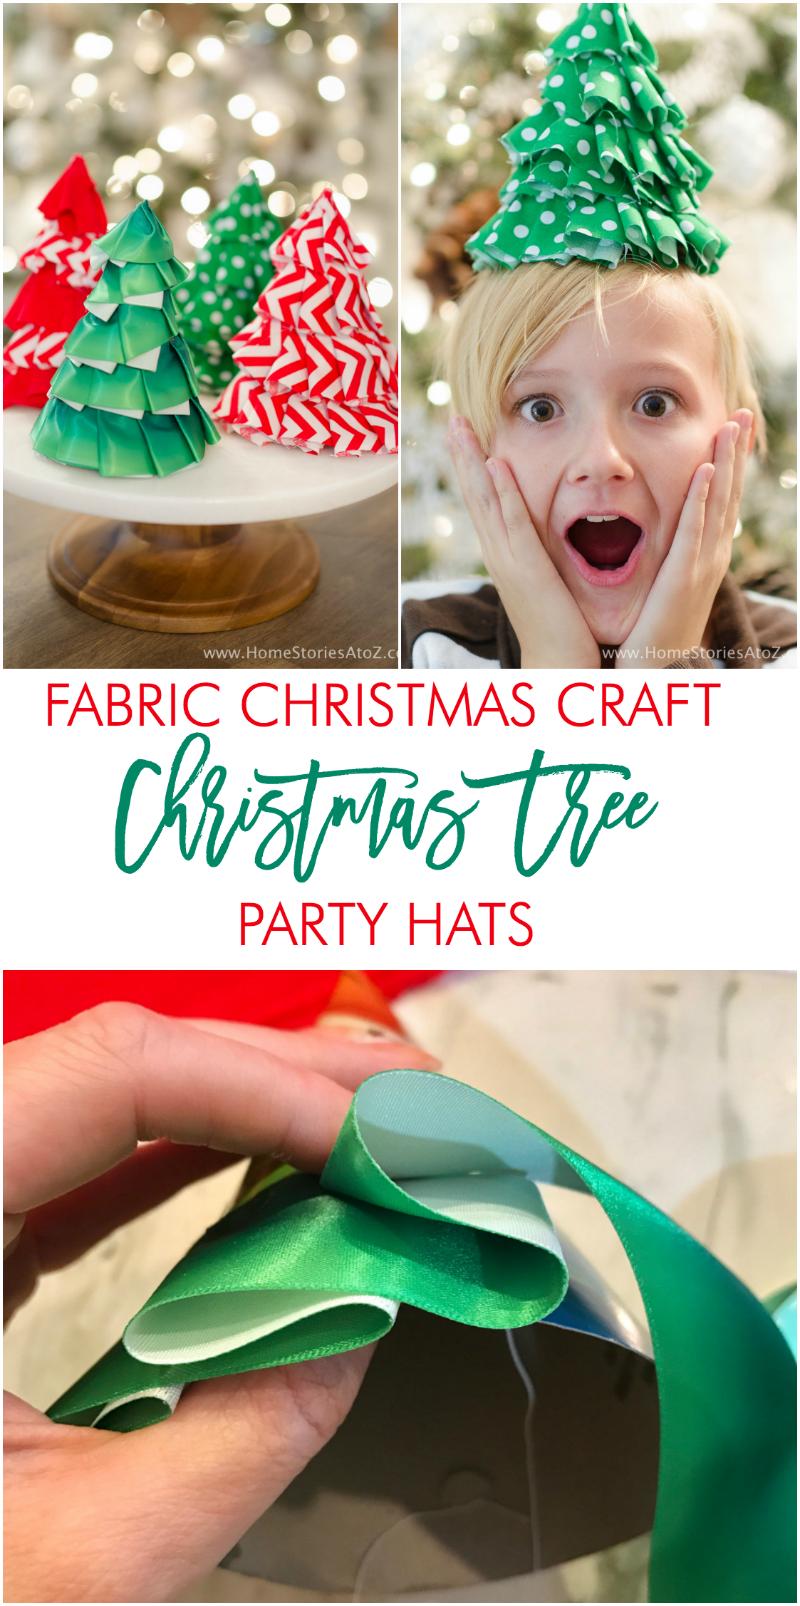 Fabric Christmas Craft Idea Diy Christmas Tree Party Hats Diy Christmas Hats Christmas Party Hats Christmas Crafts